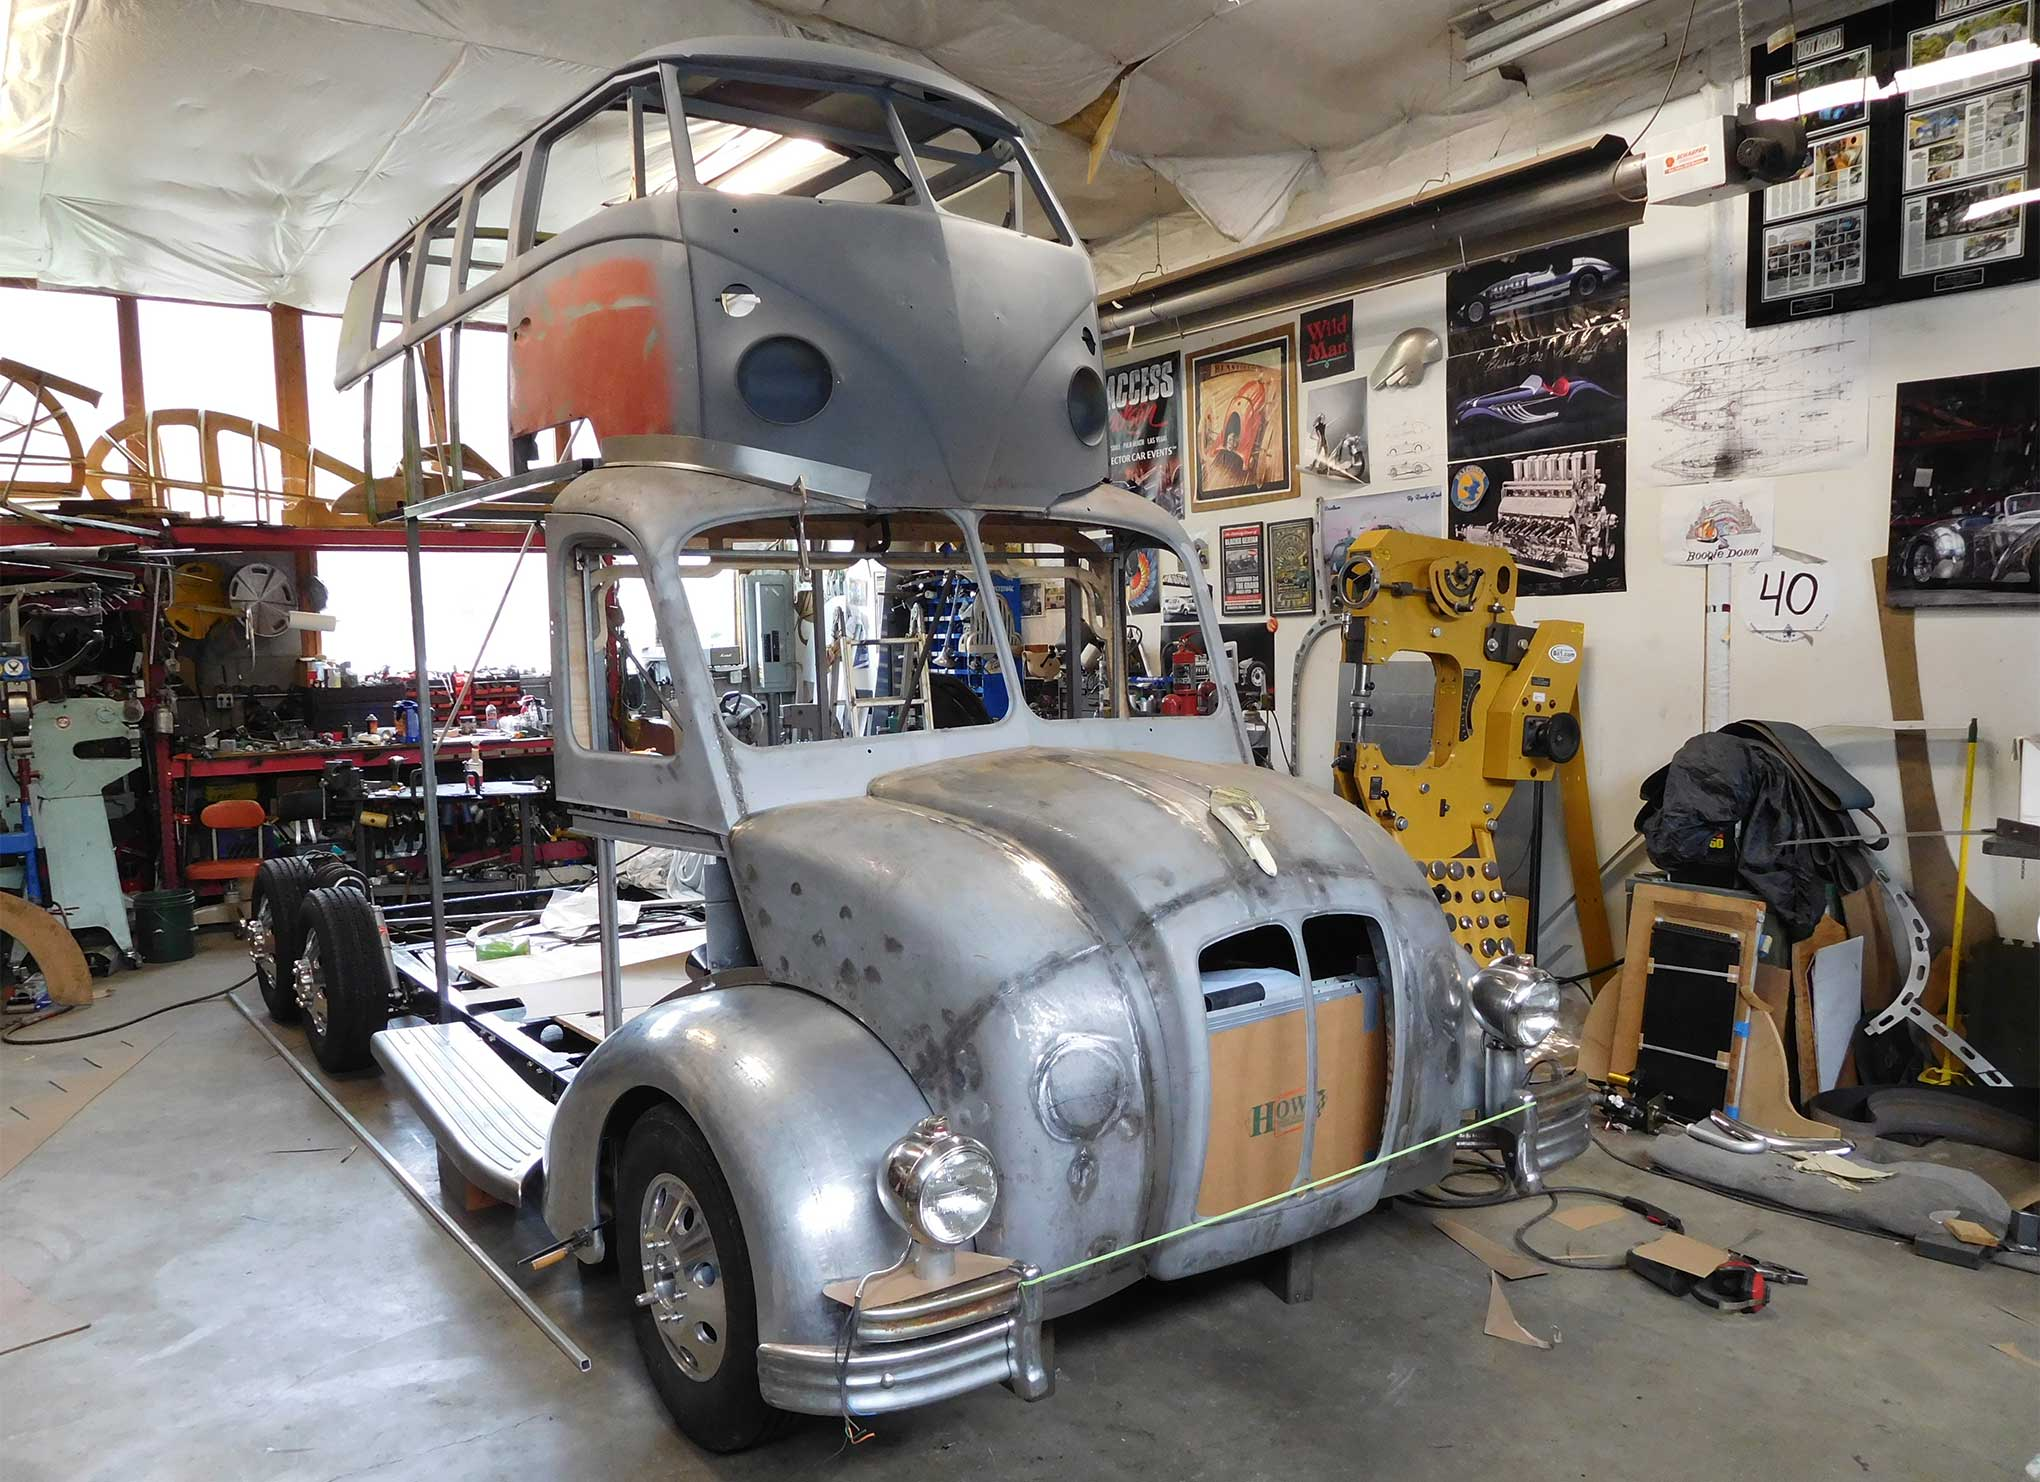 Randy Grubb's Magic Bus before welding